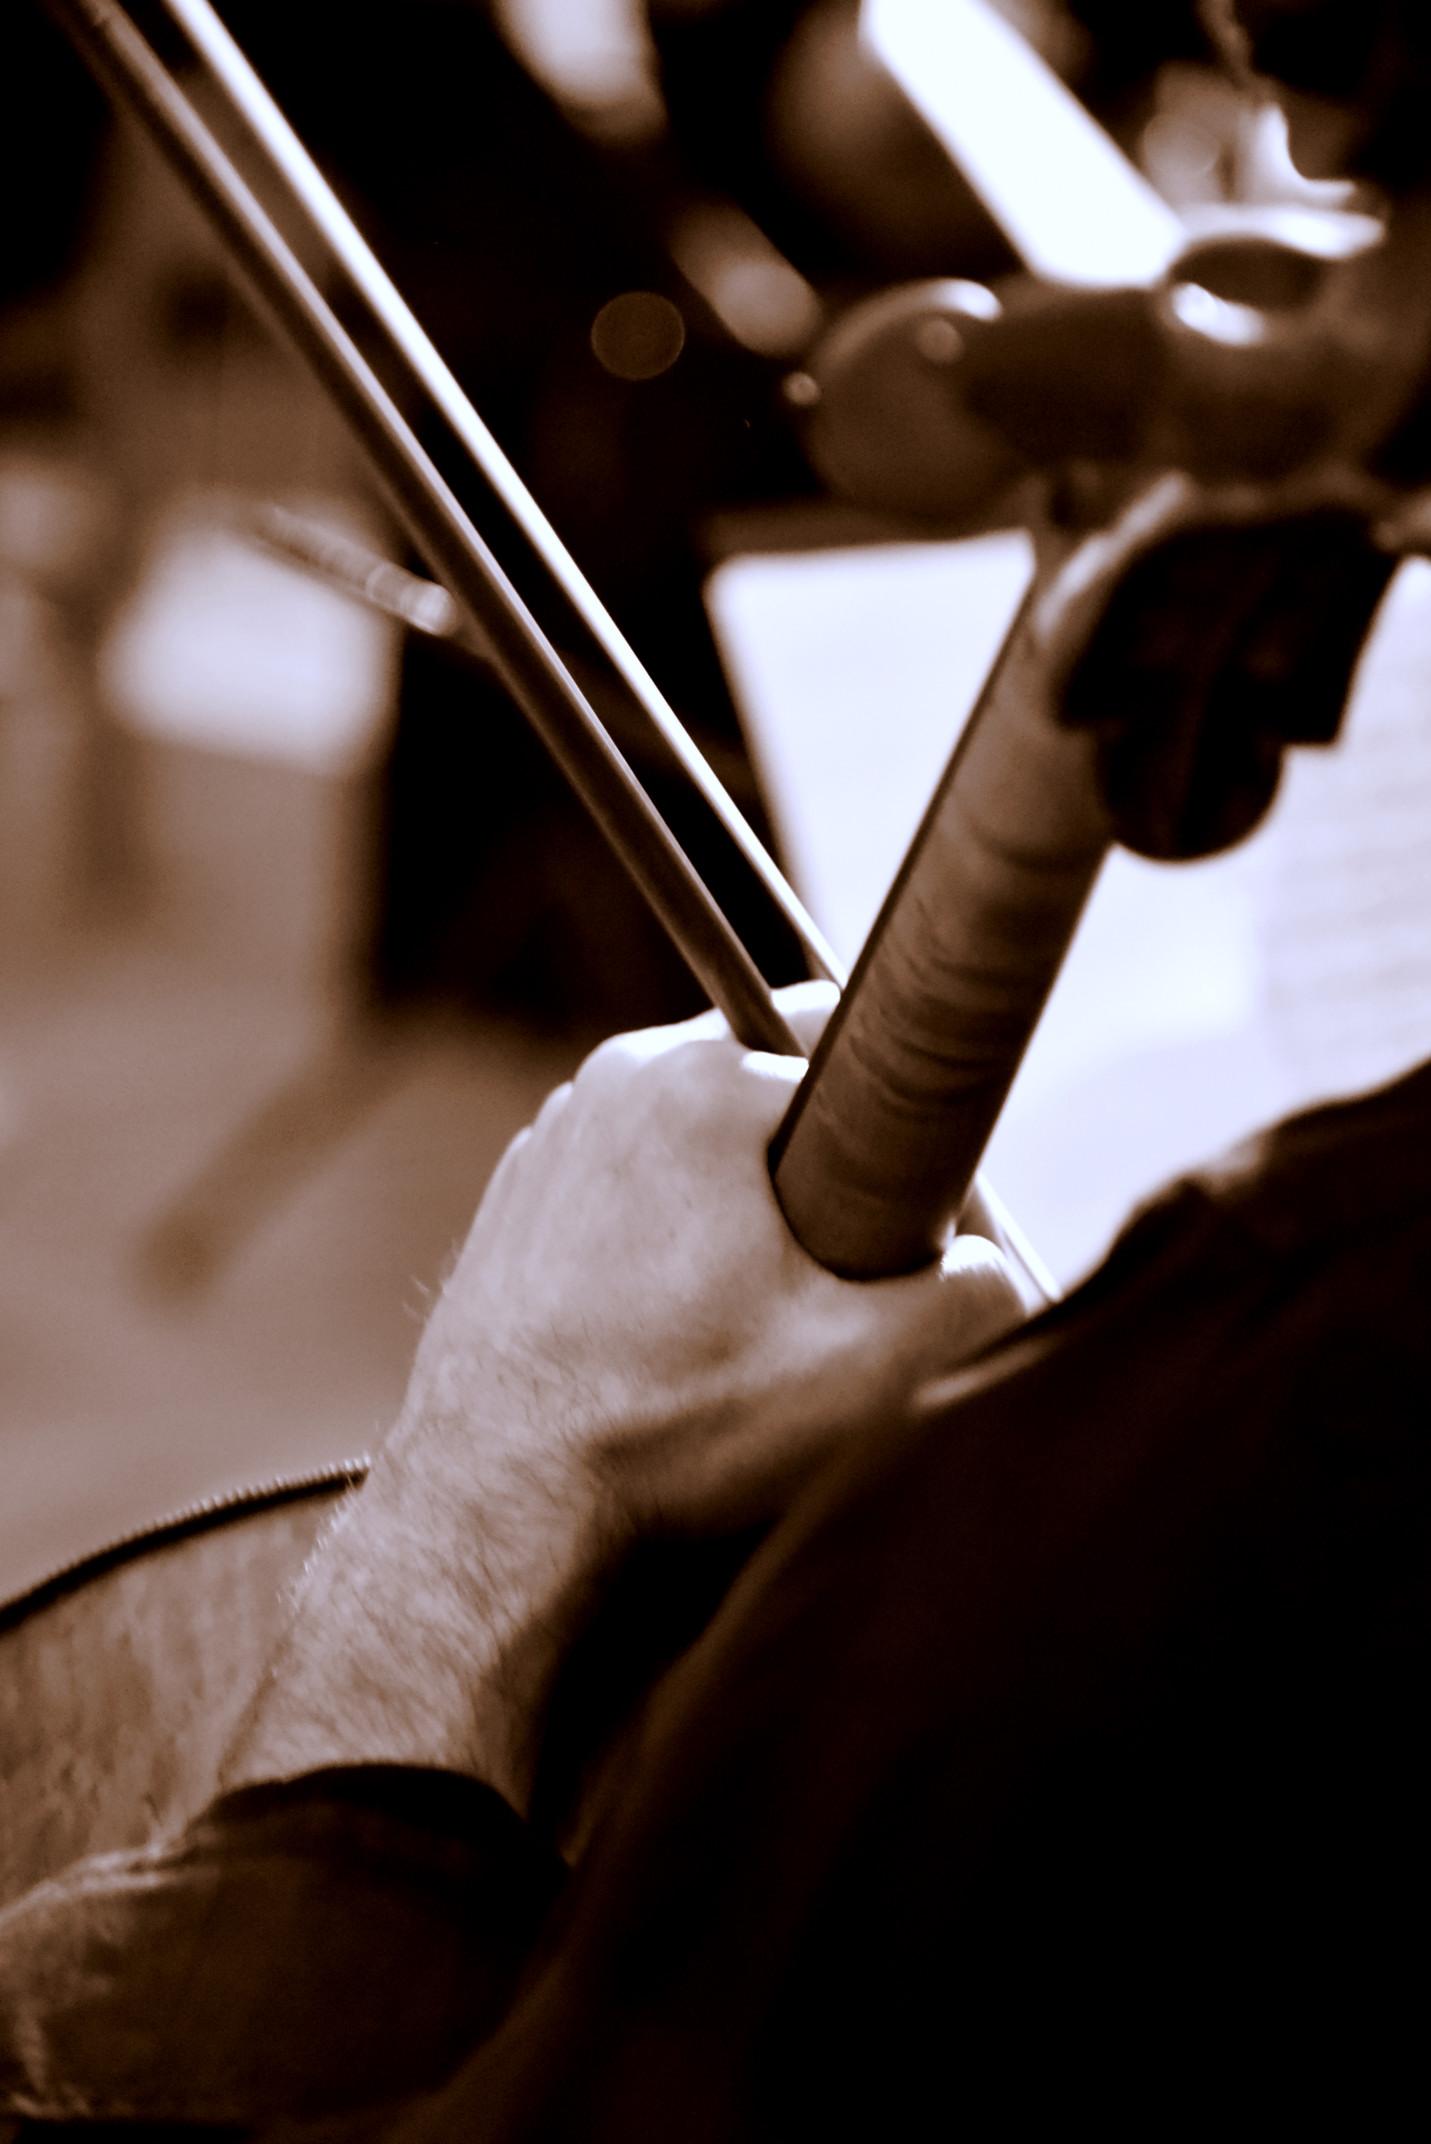 http://orquestatutti.com/wp/wp-content/uploads/2017/06/DSC_0261_12.jpg